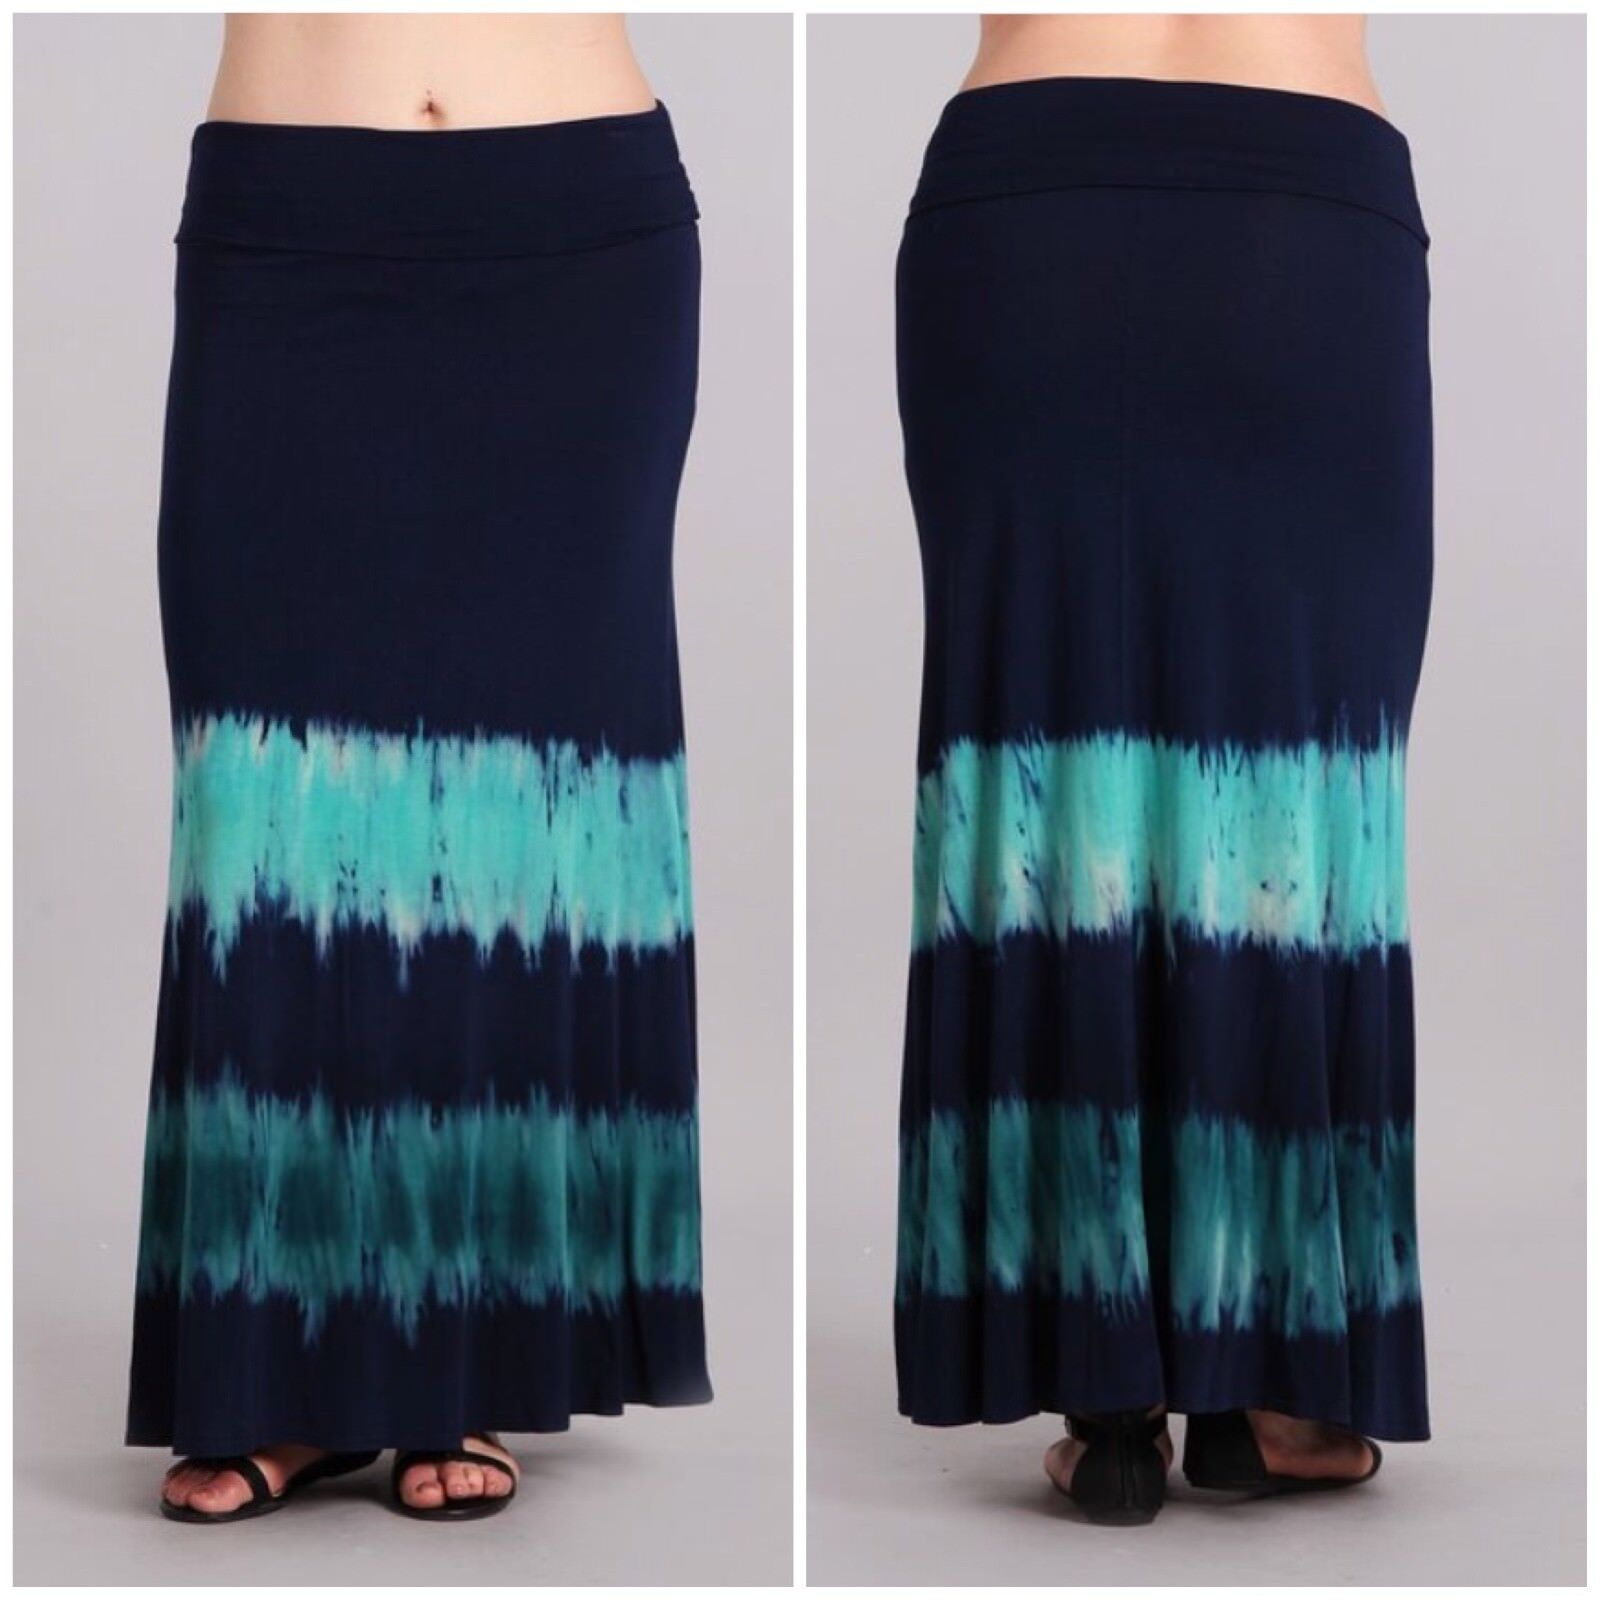 Plus Tie Dye Maxi Skirt Full Length High Waist Foldover 1X 2X 3X bluee Boho